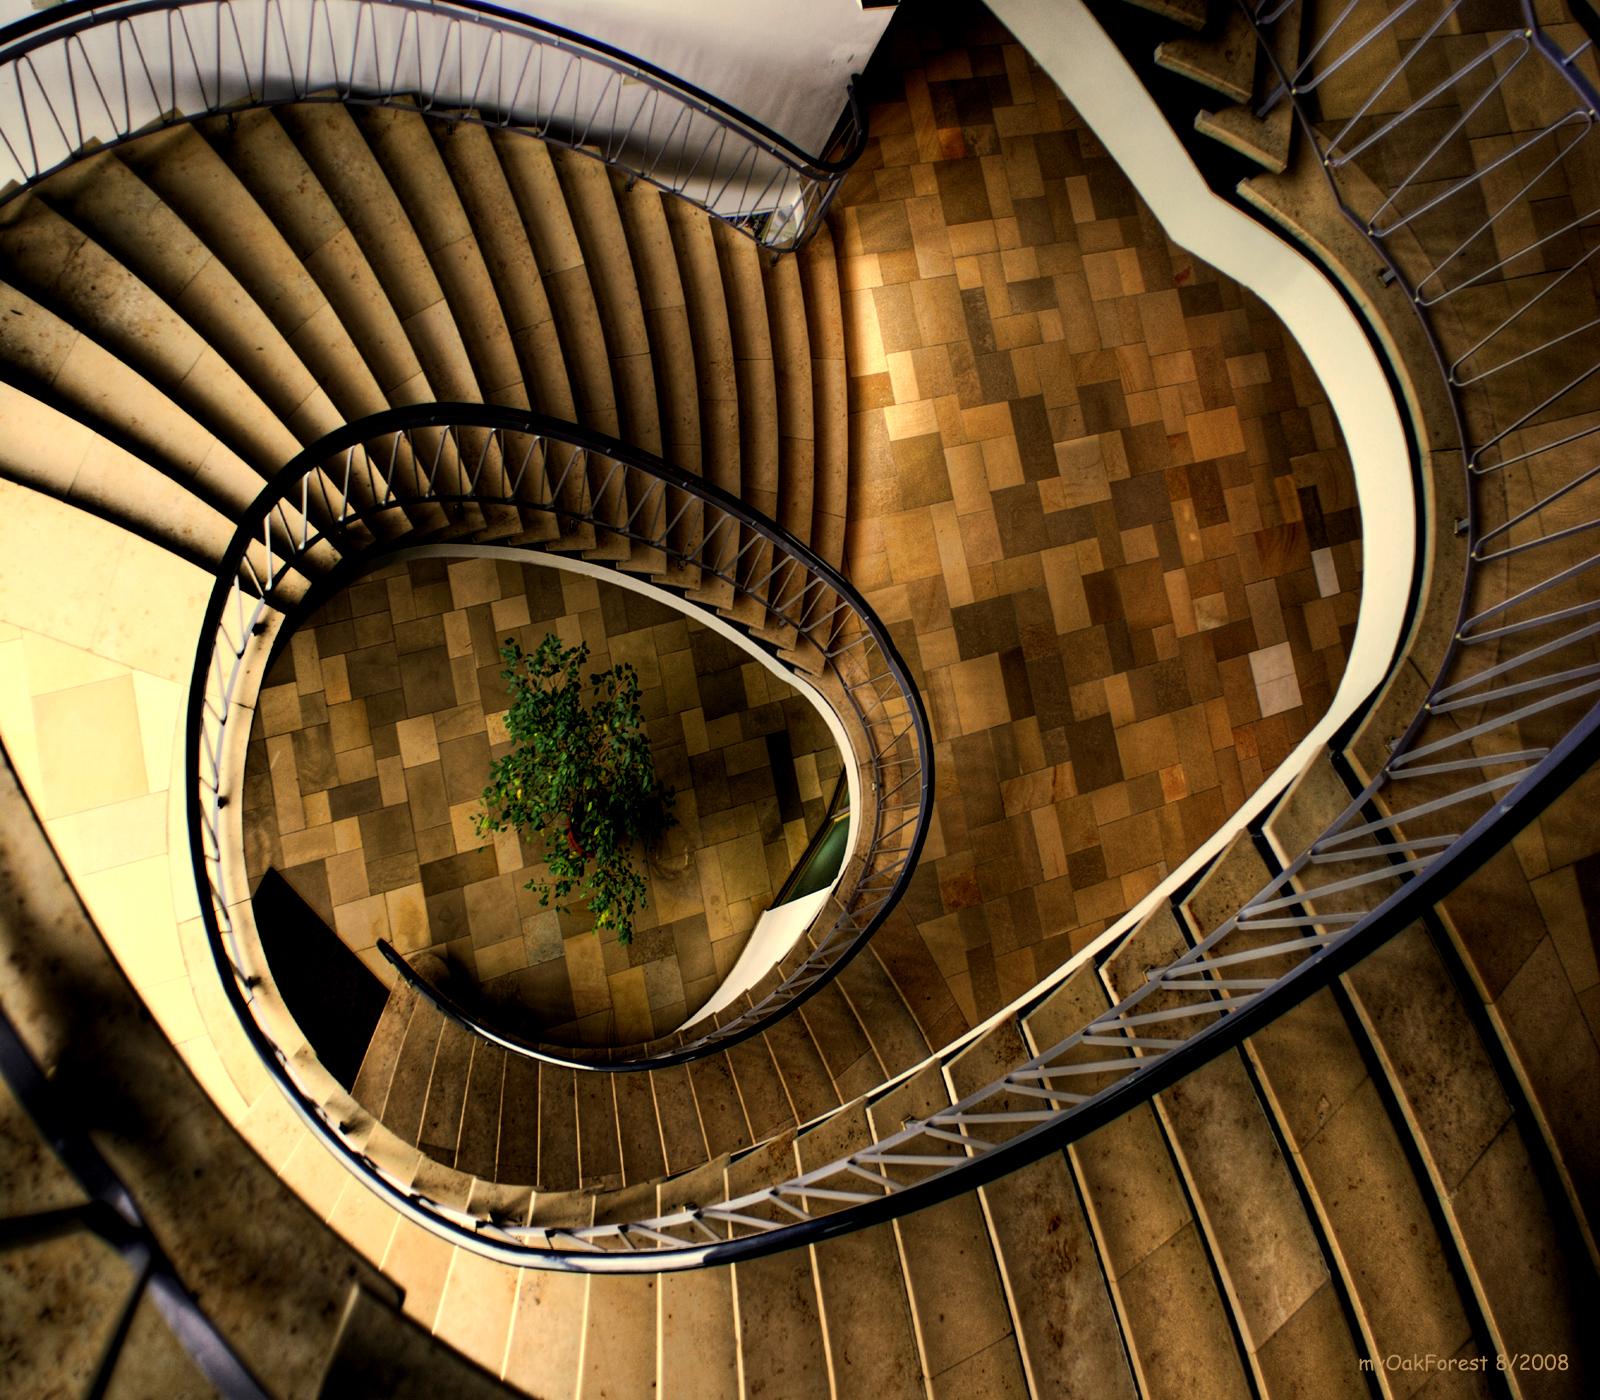 Treppen Kiel wallpaper architecture building spiral symmetry circle arch